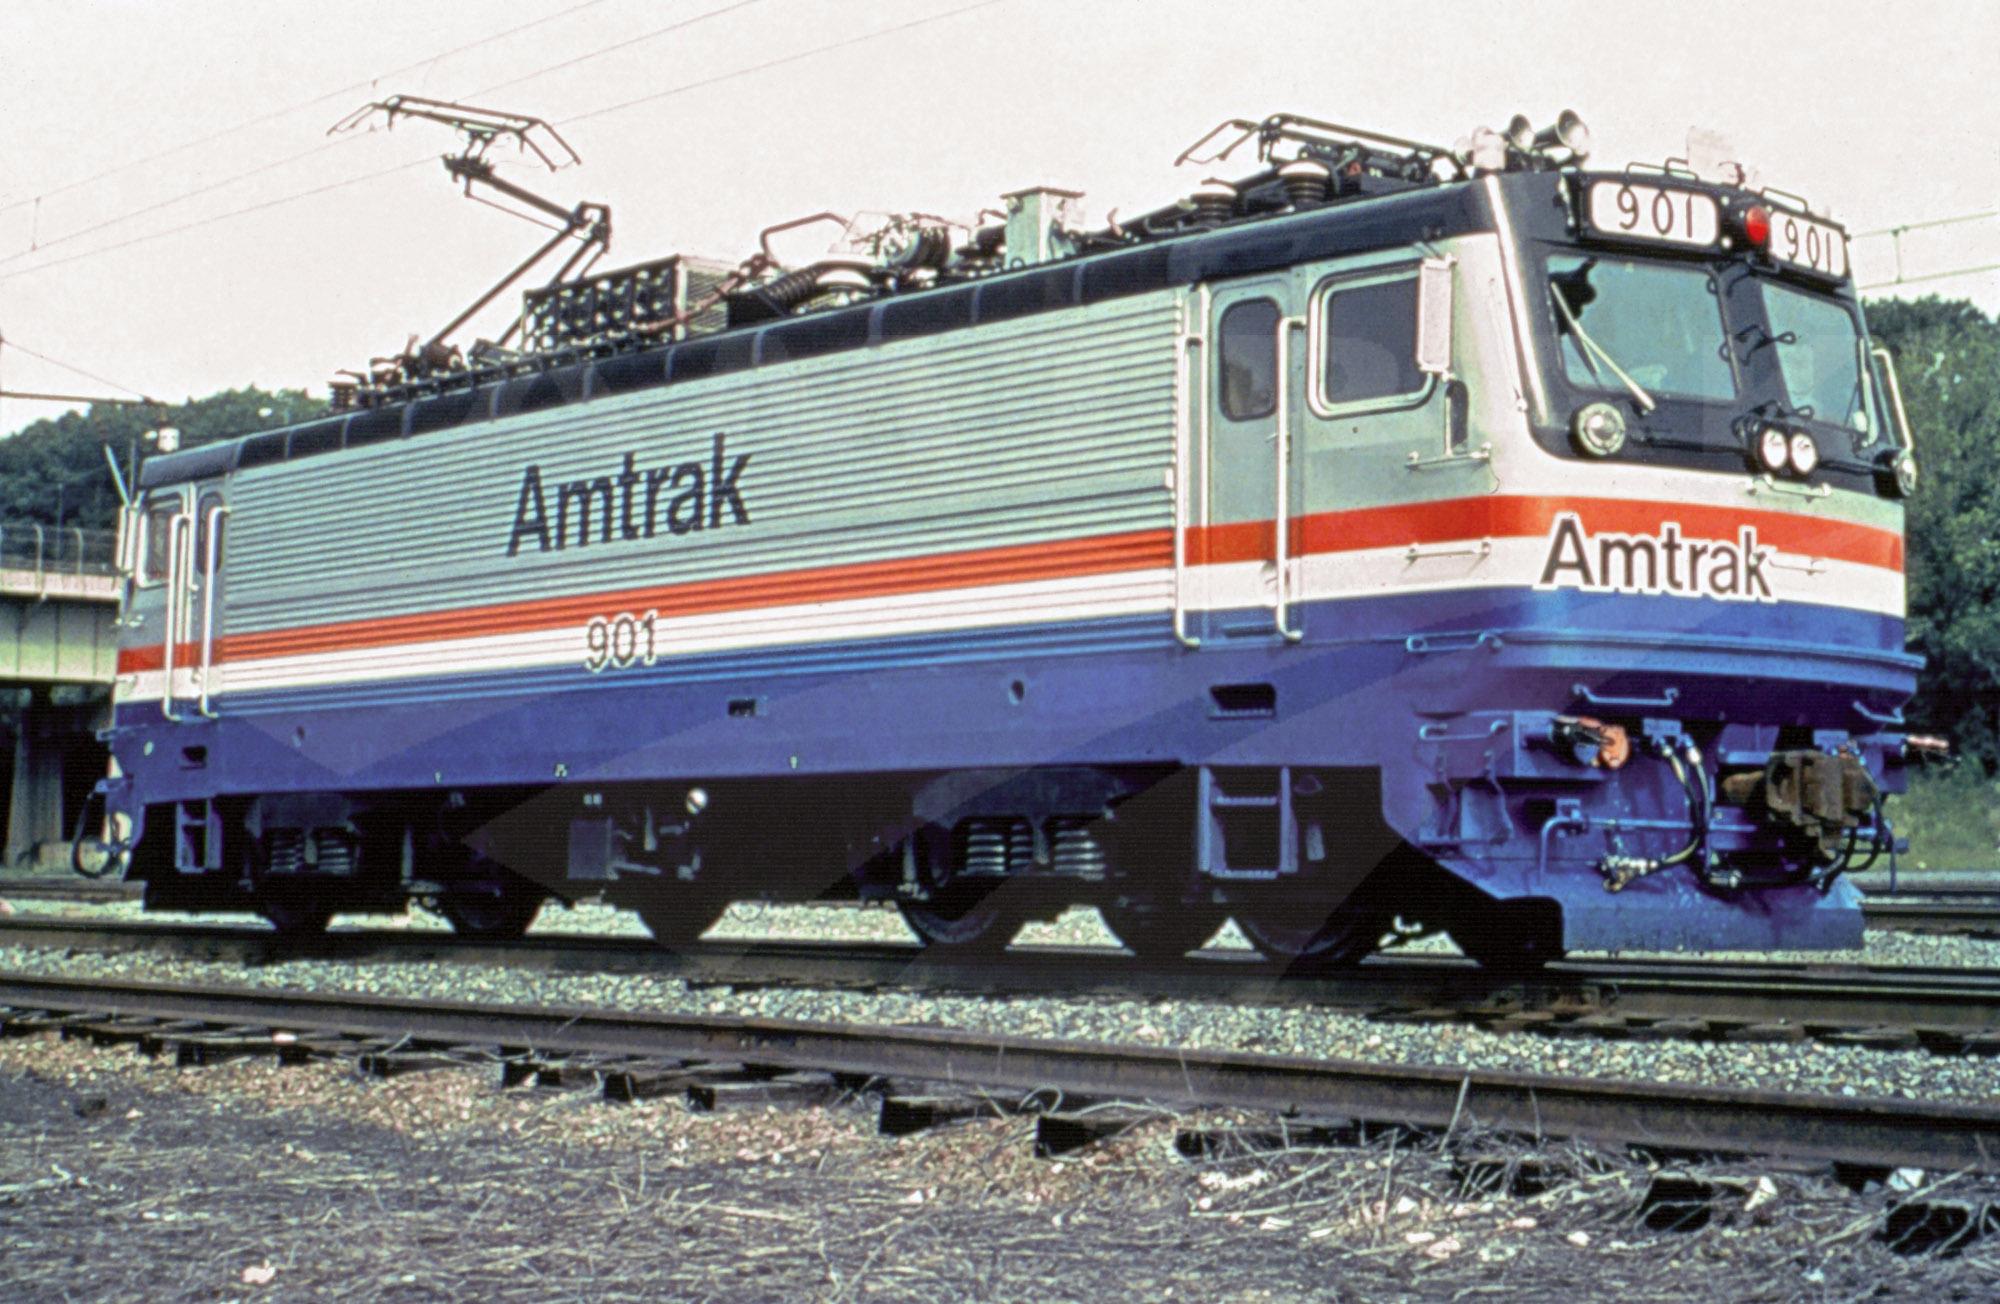 Aem 7 Locomotive No 901 Amtrak History Of America S